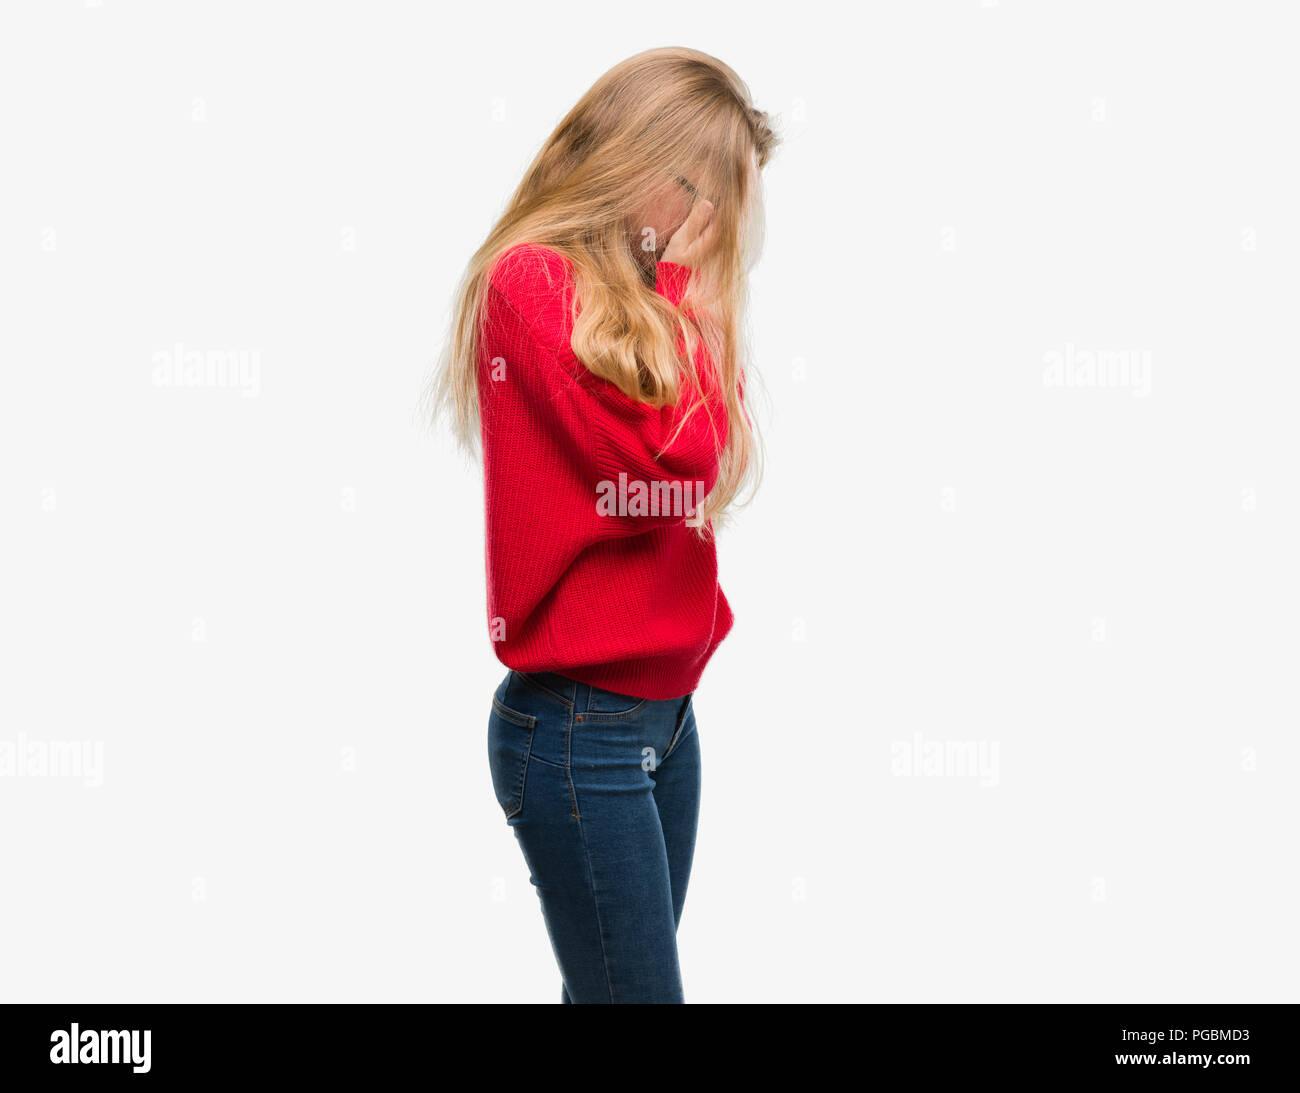 Adolescente Rubia Mujer Vistiendo Remera Roja Con Expresión Triste